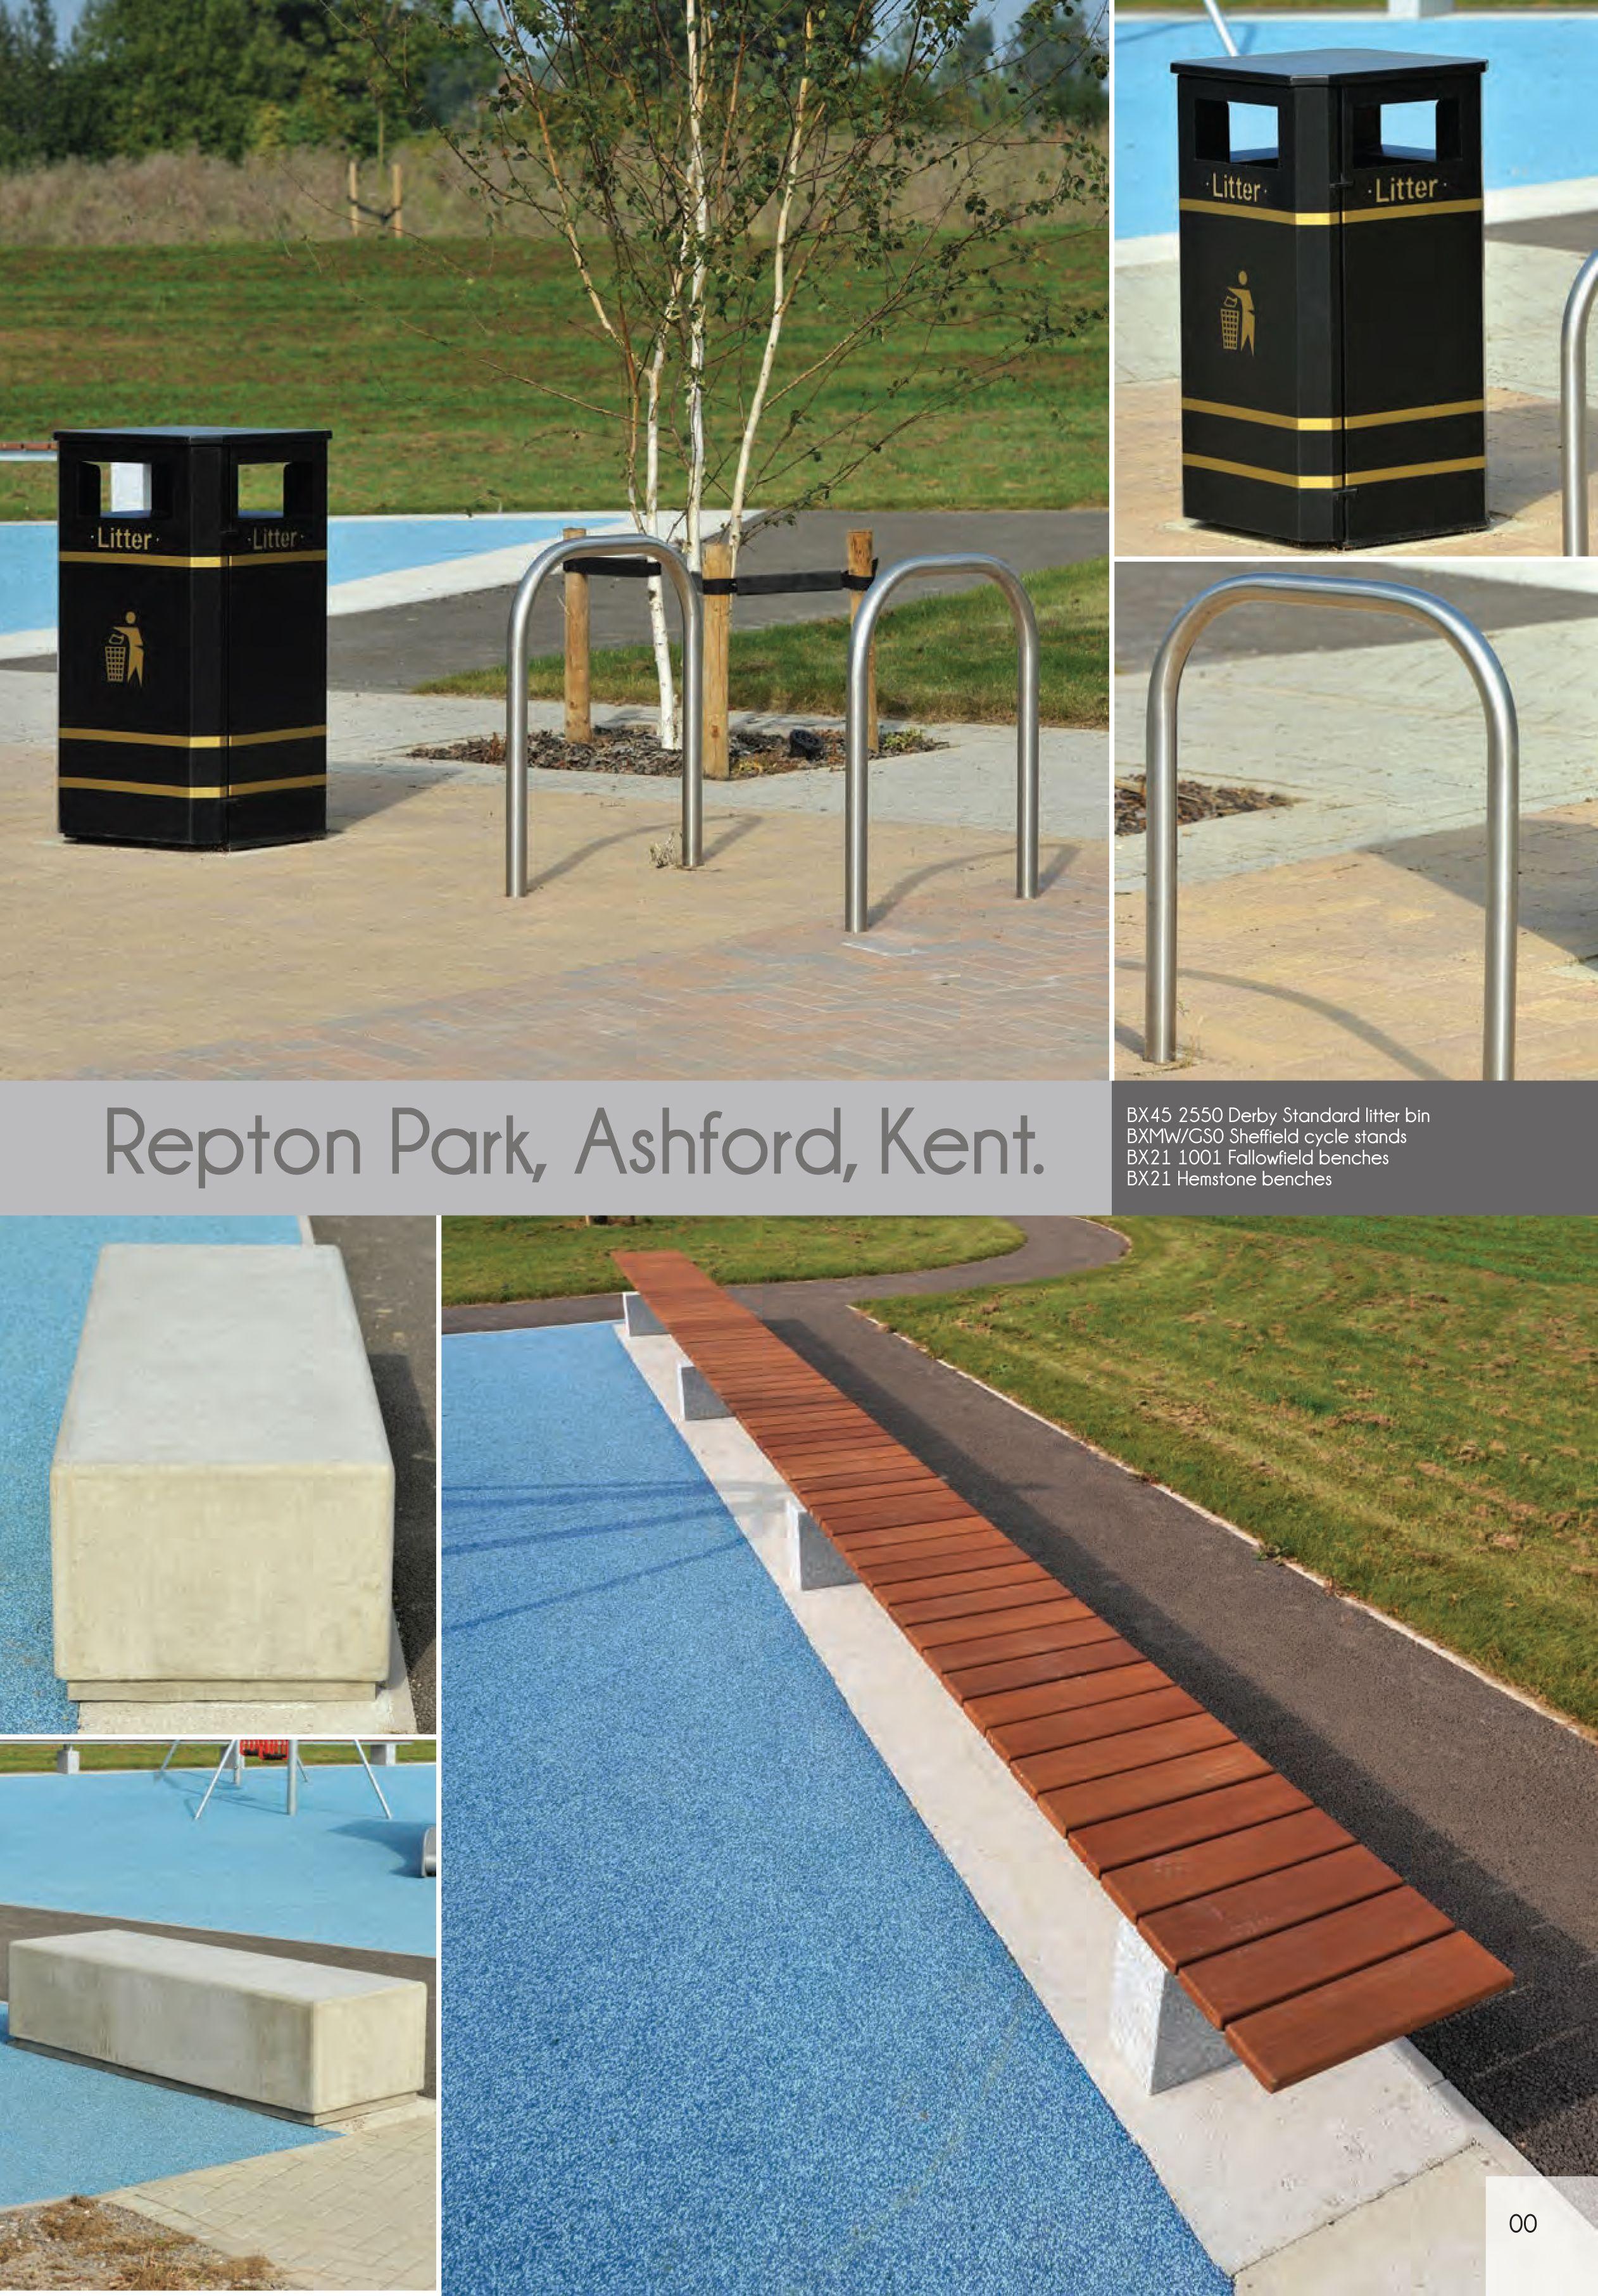 Repton Park, Ashford Kent | Street Furniture   Derby Standard Litter BIns,  Sheffield Cycle